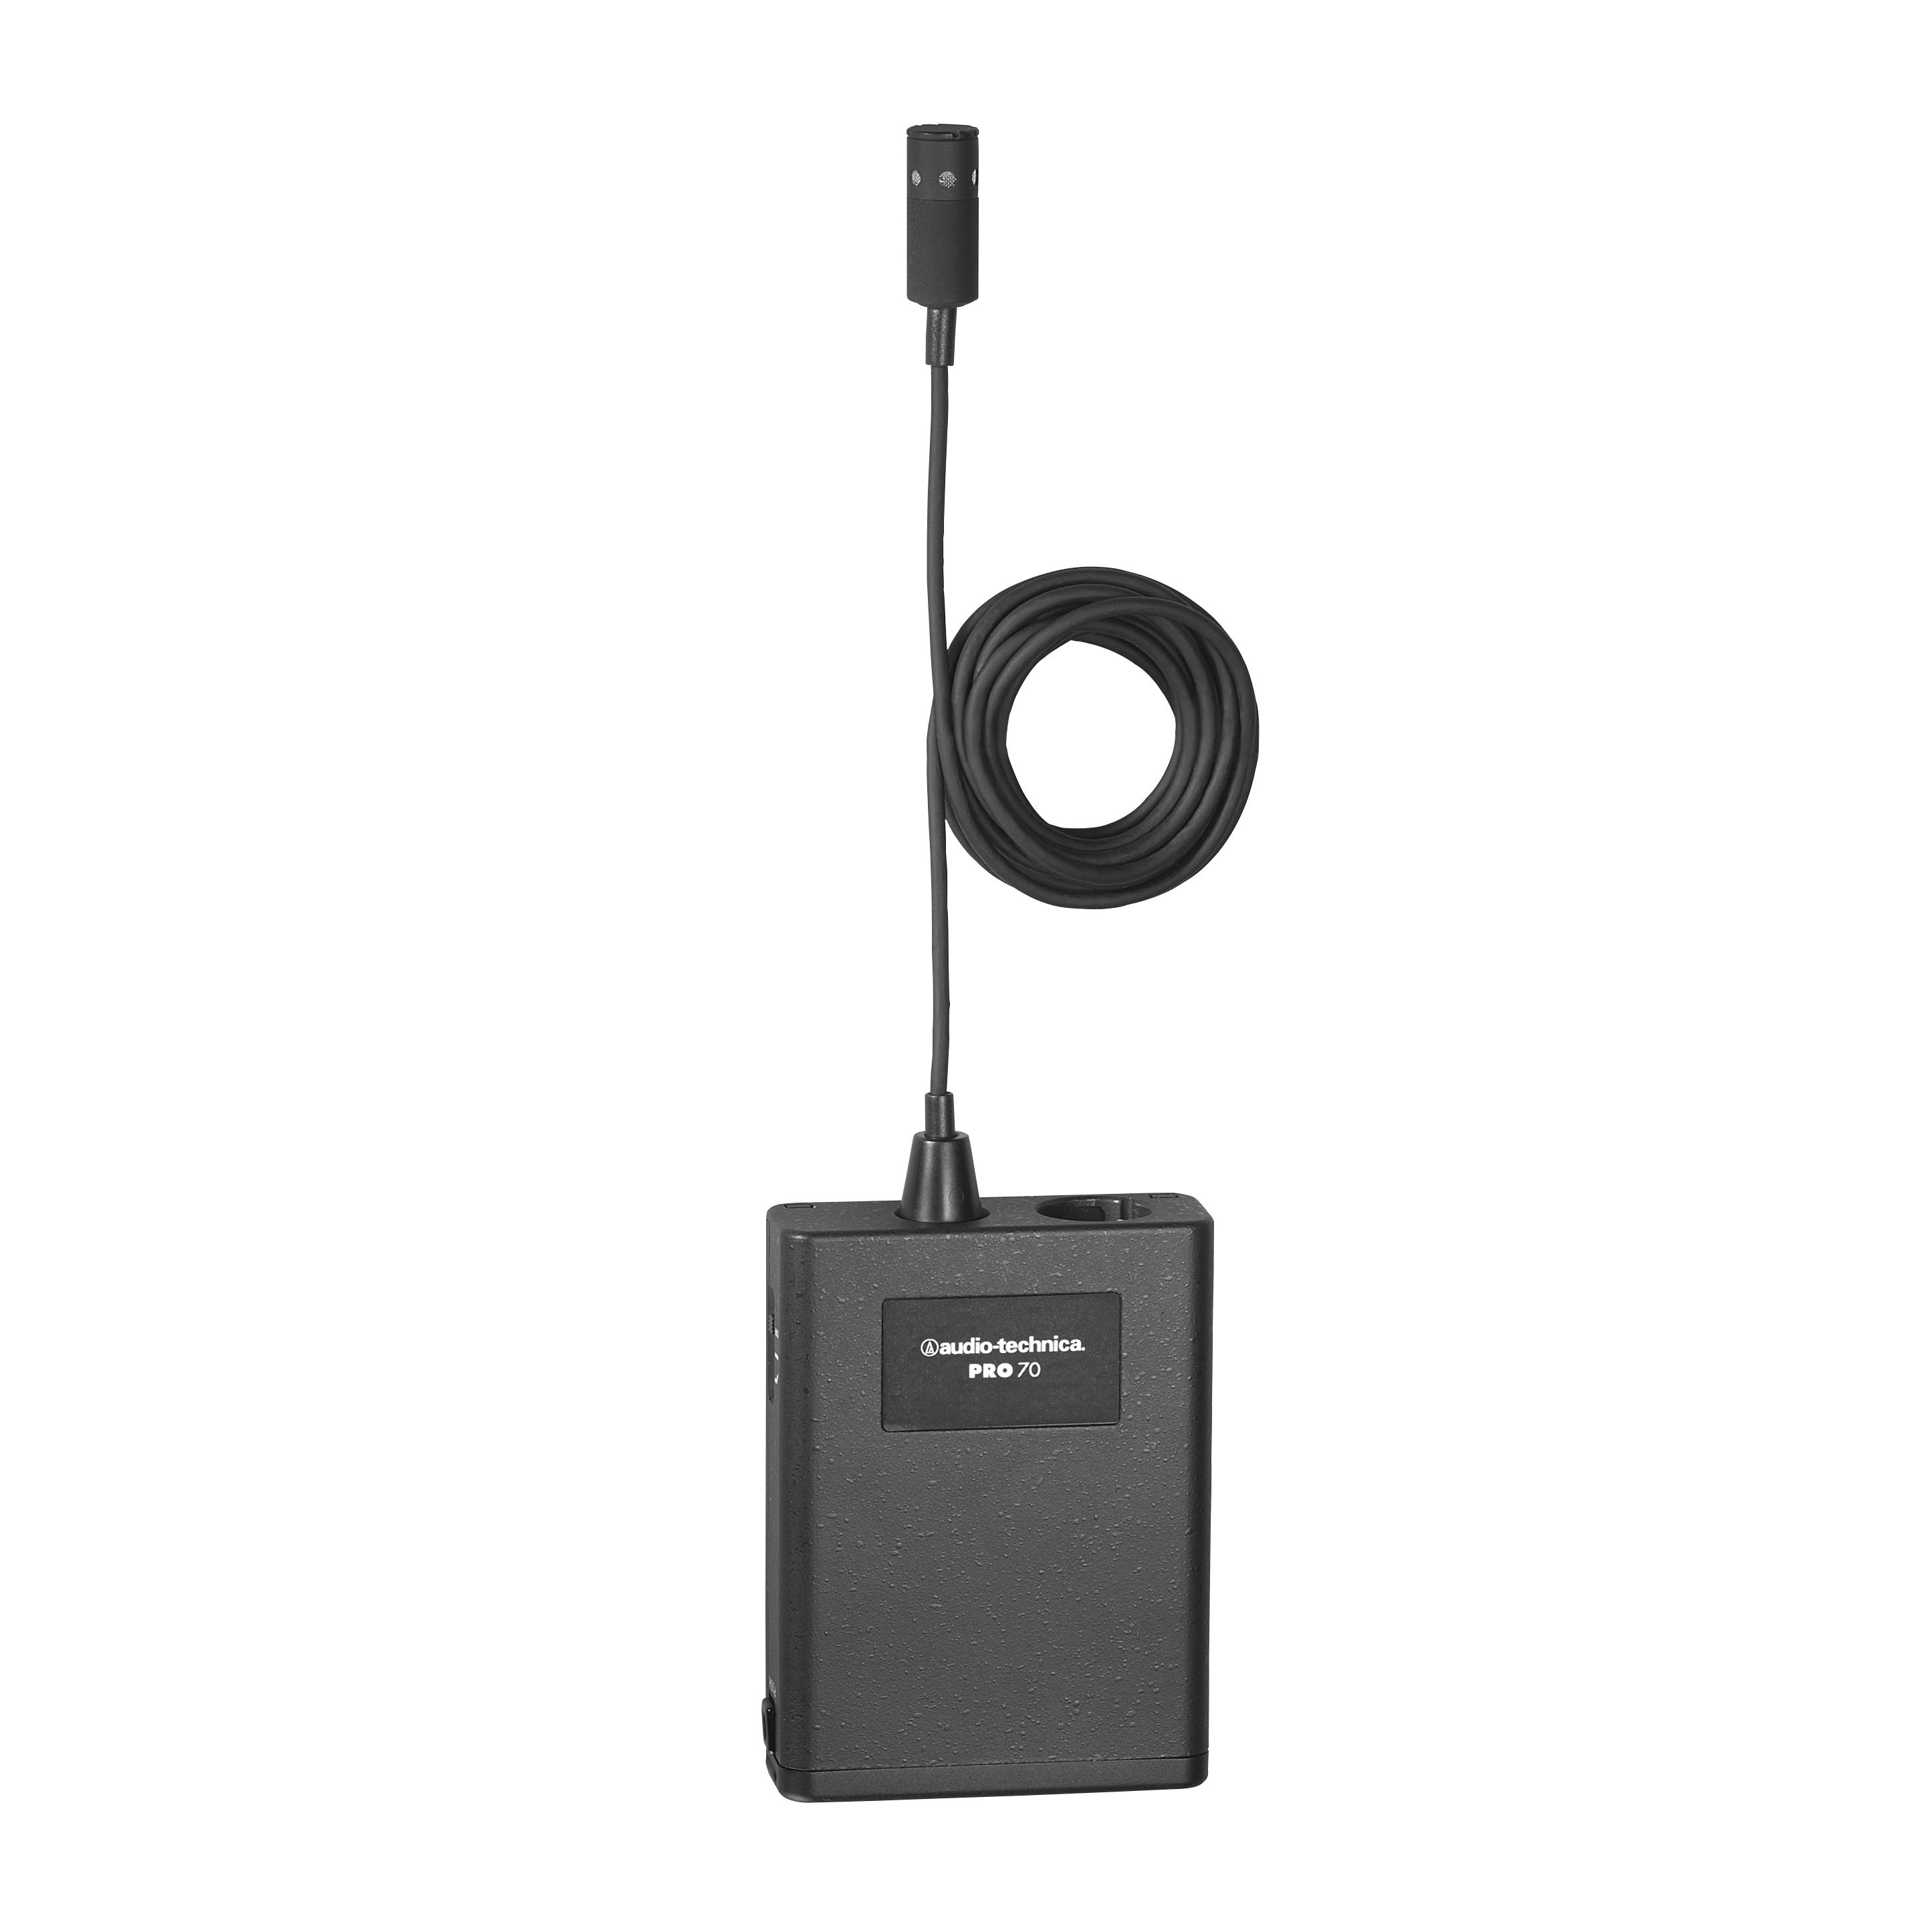 Audio-Technica PRO 70 Cardioid Condenser Lavalier/Instrument